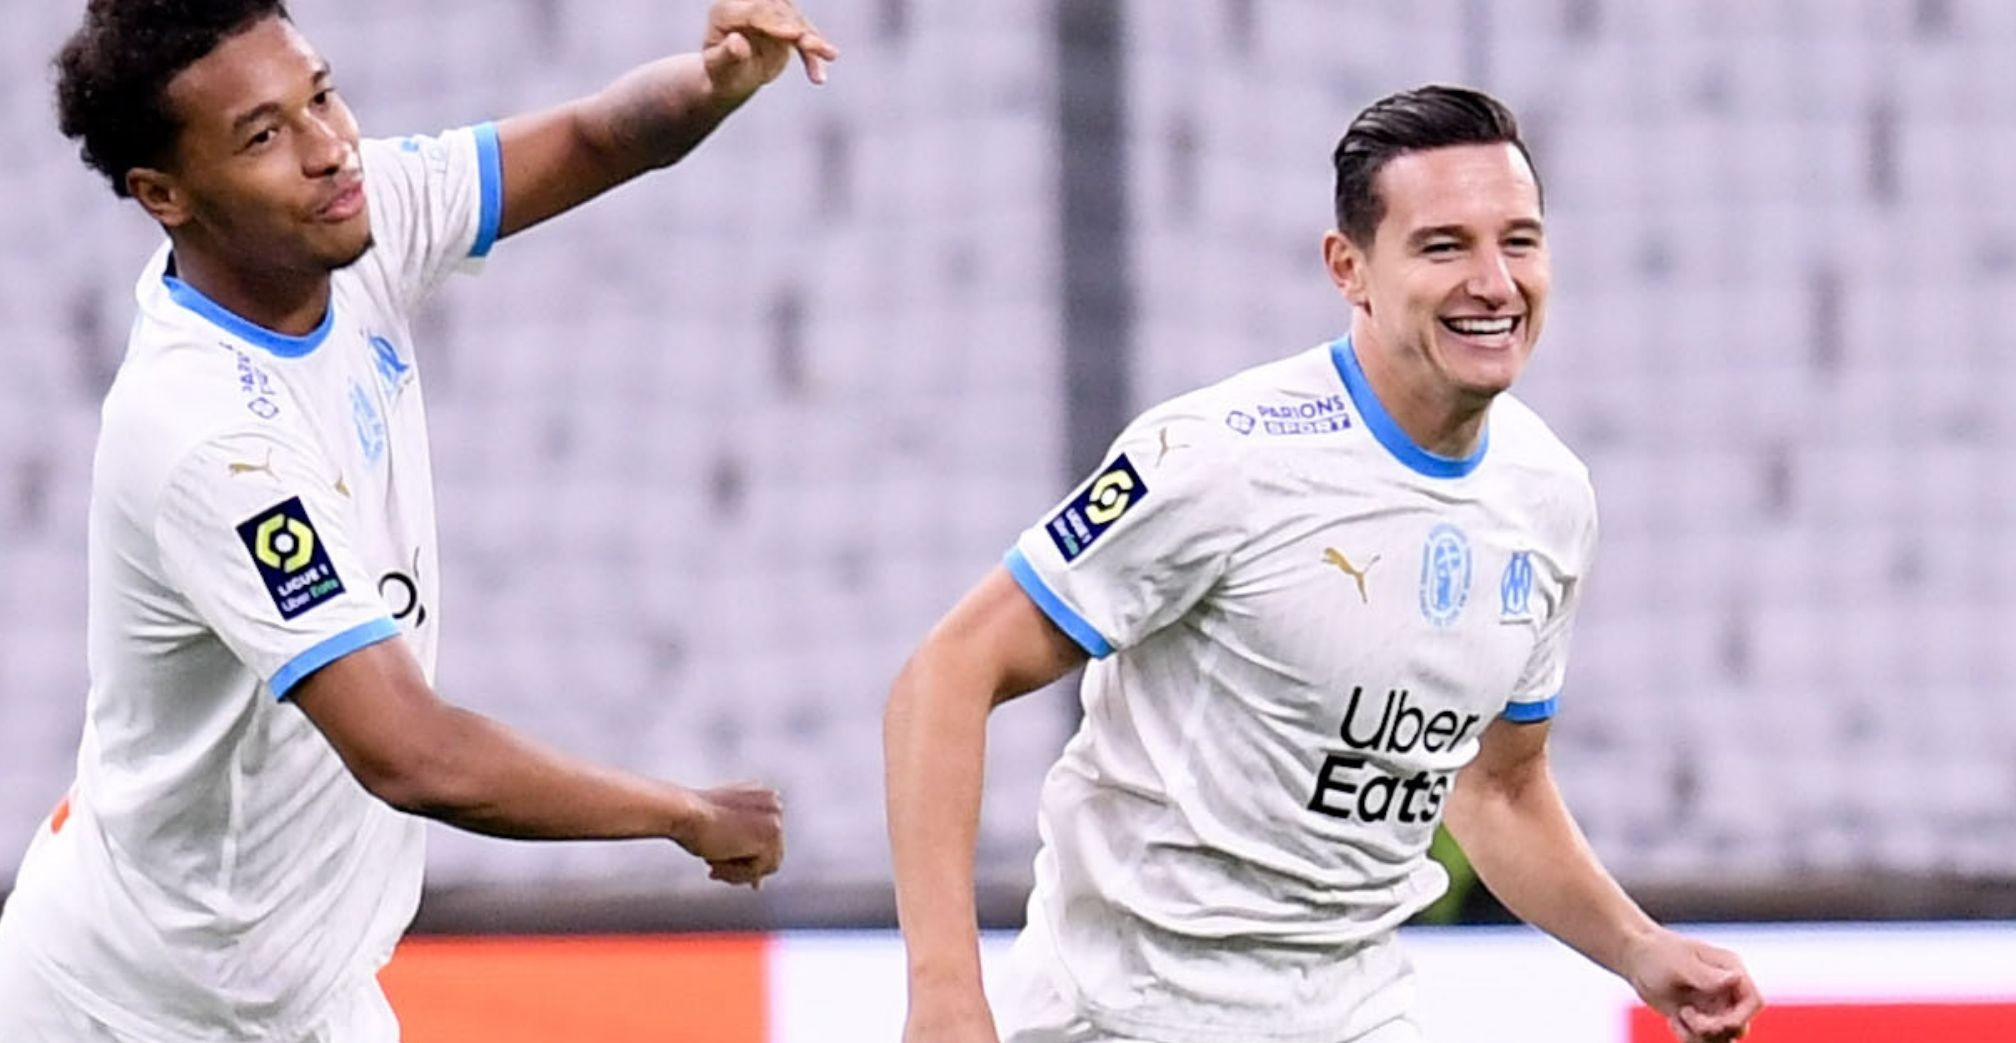 Thauvin stunner helps Marseille past Bordeaux, Lorient riot